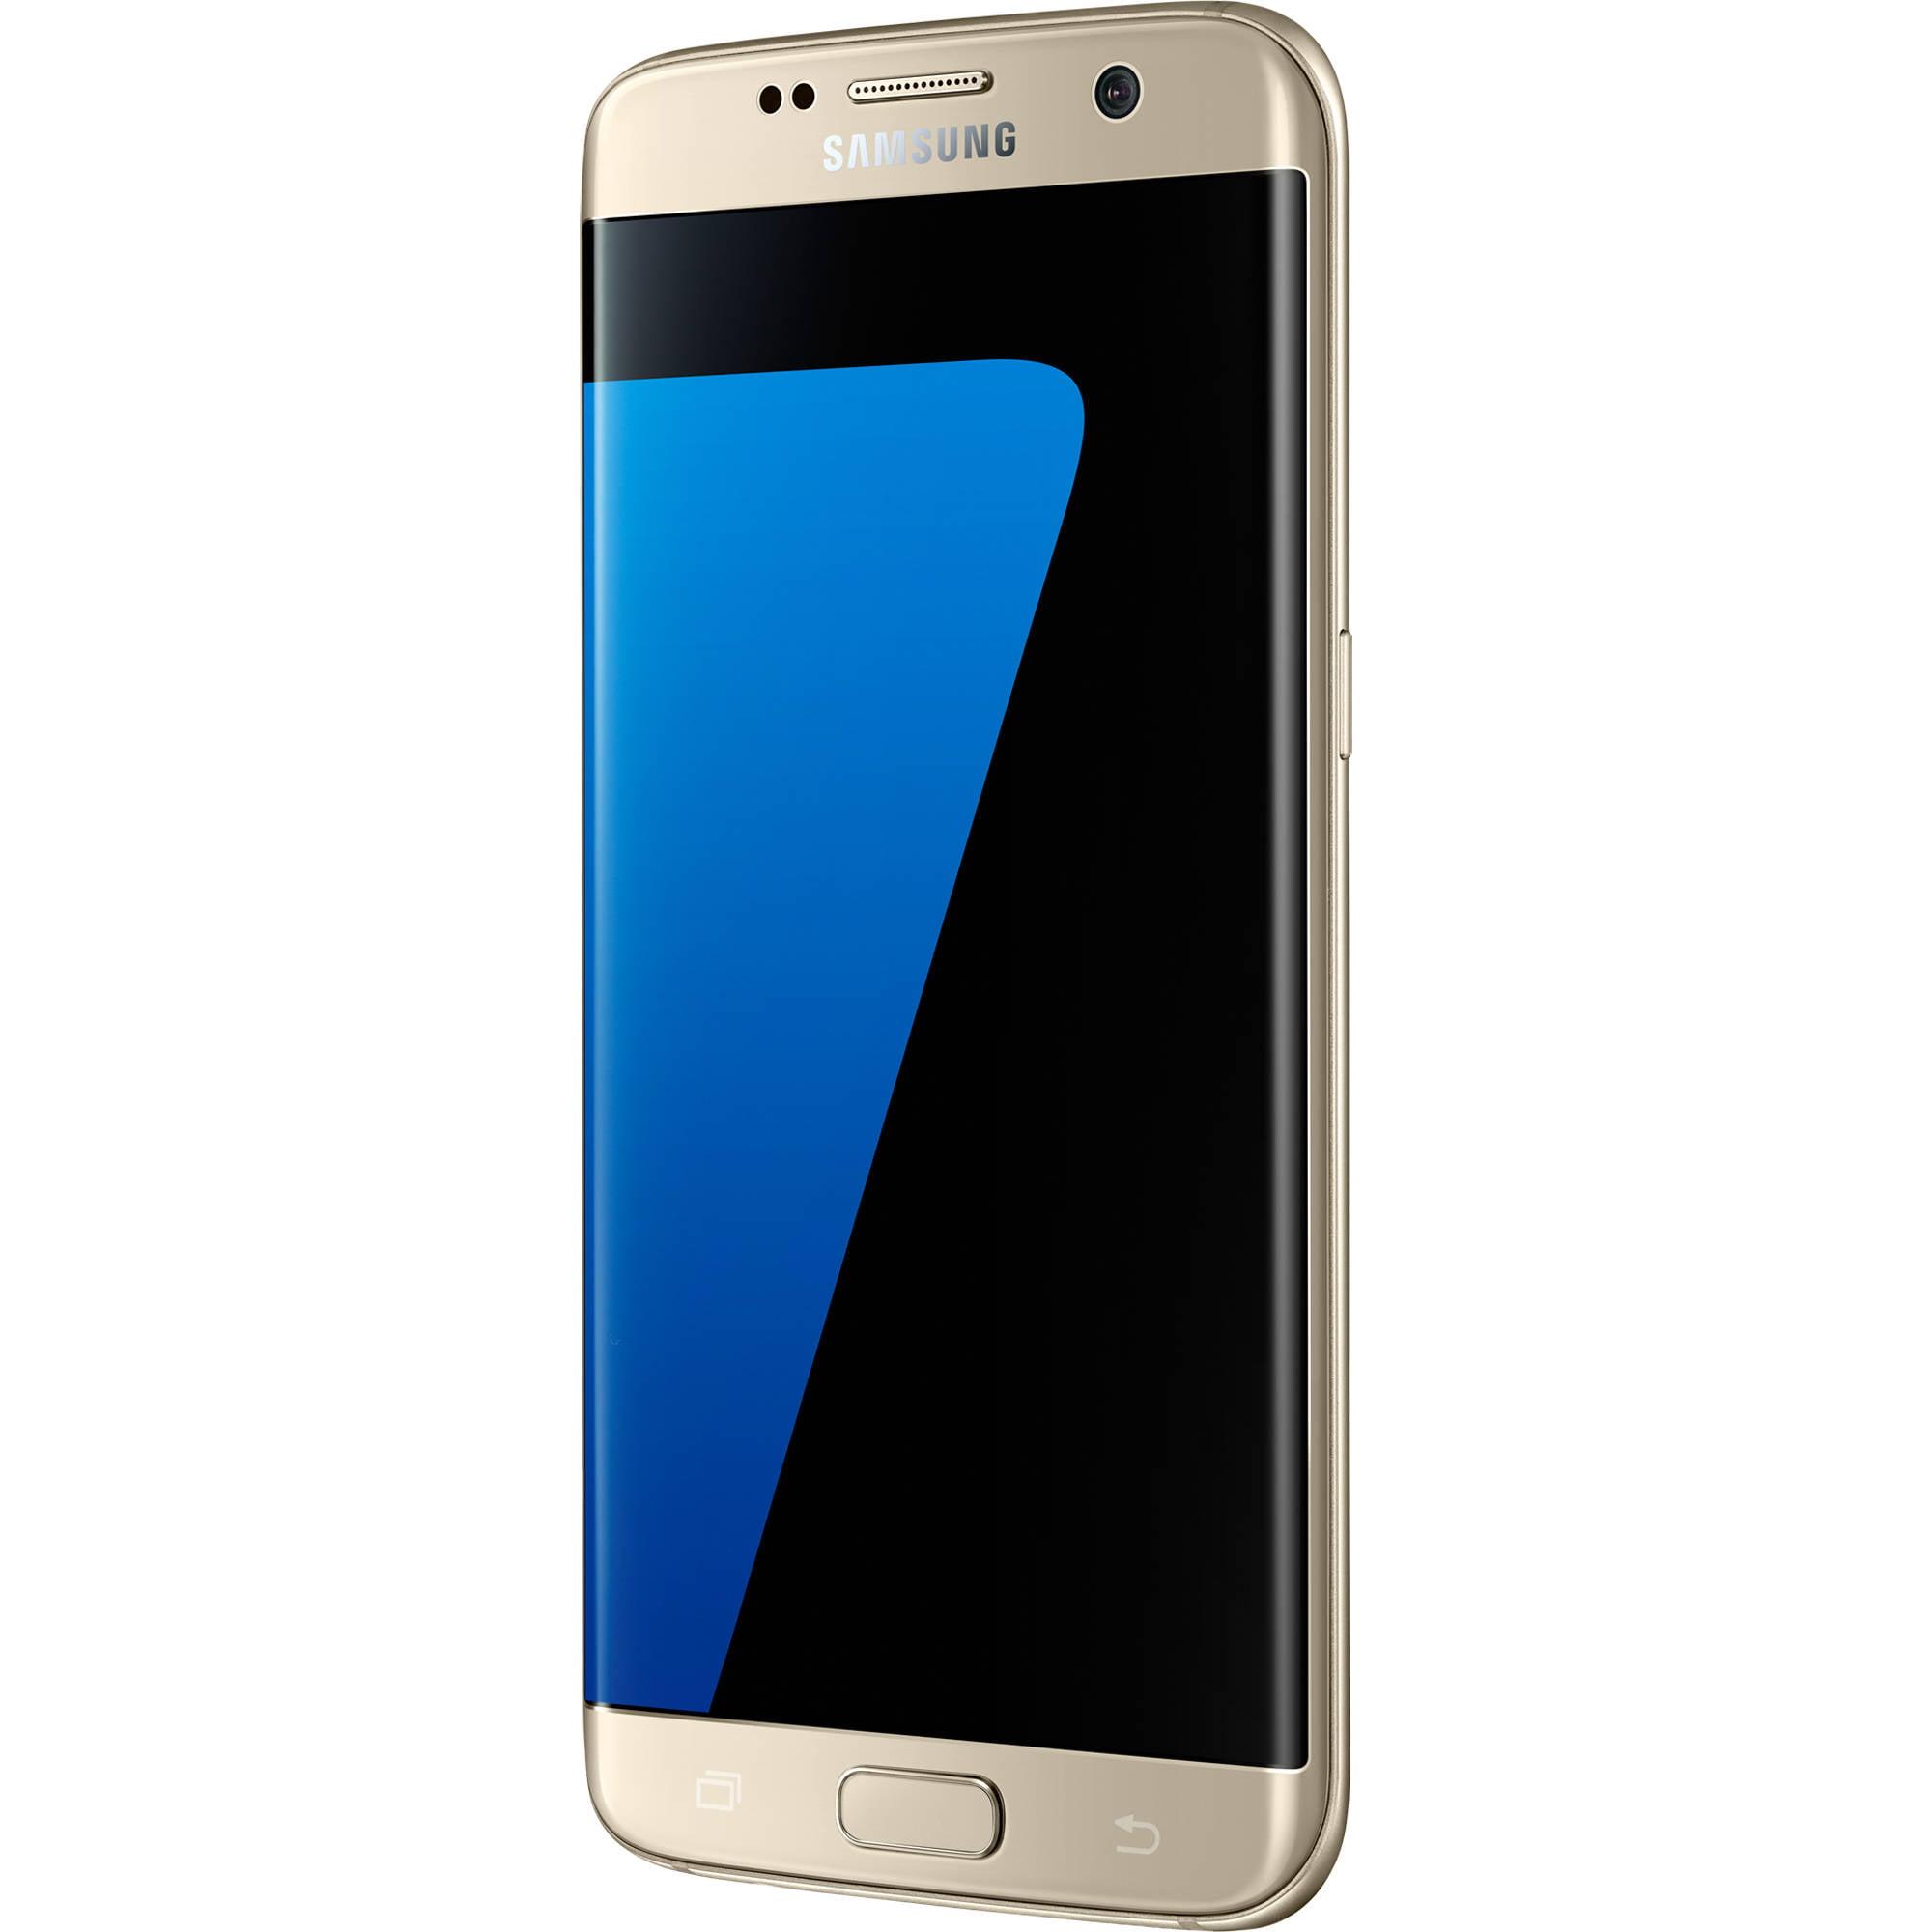 Samsung Galaxy S7 Edge 32gb Unlocked Smartphone Black 32 Gb Coral Blue